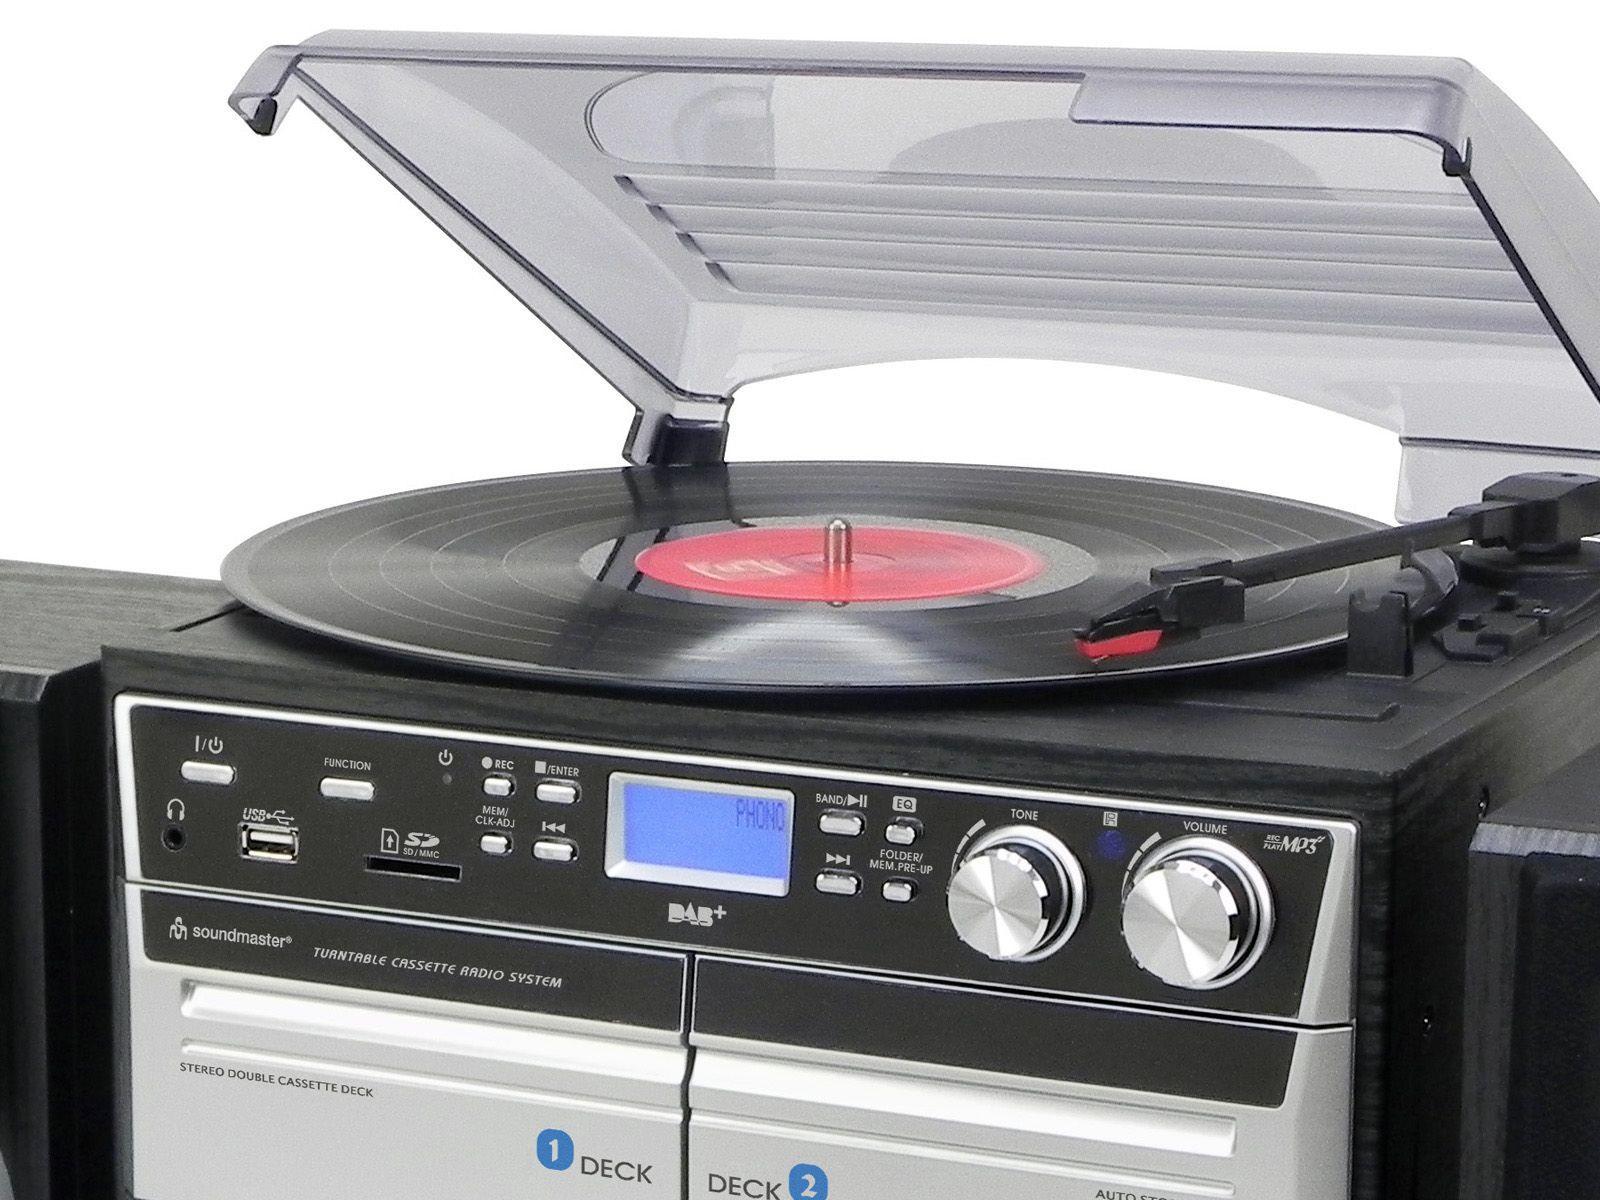 Buy Soundmaster Mcd5500 Cd Radio Tape Amp Record Player